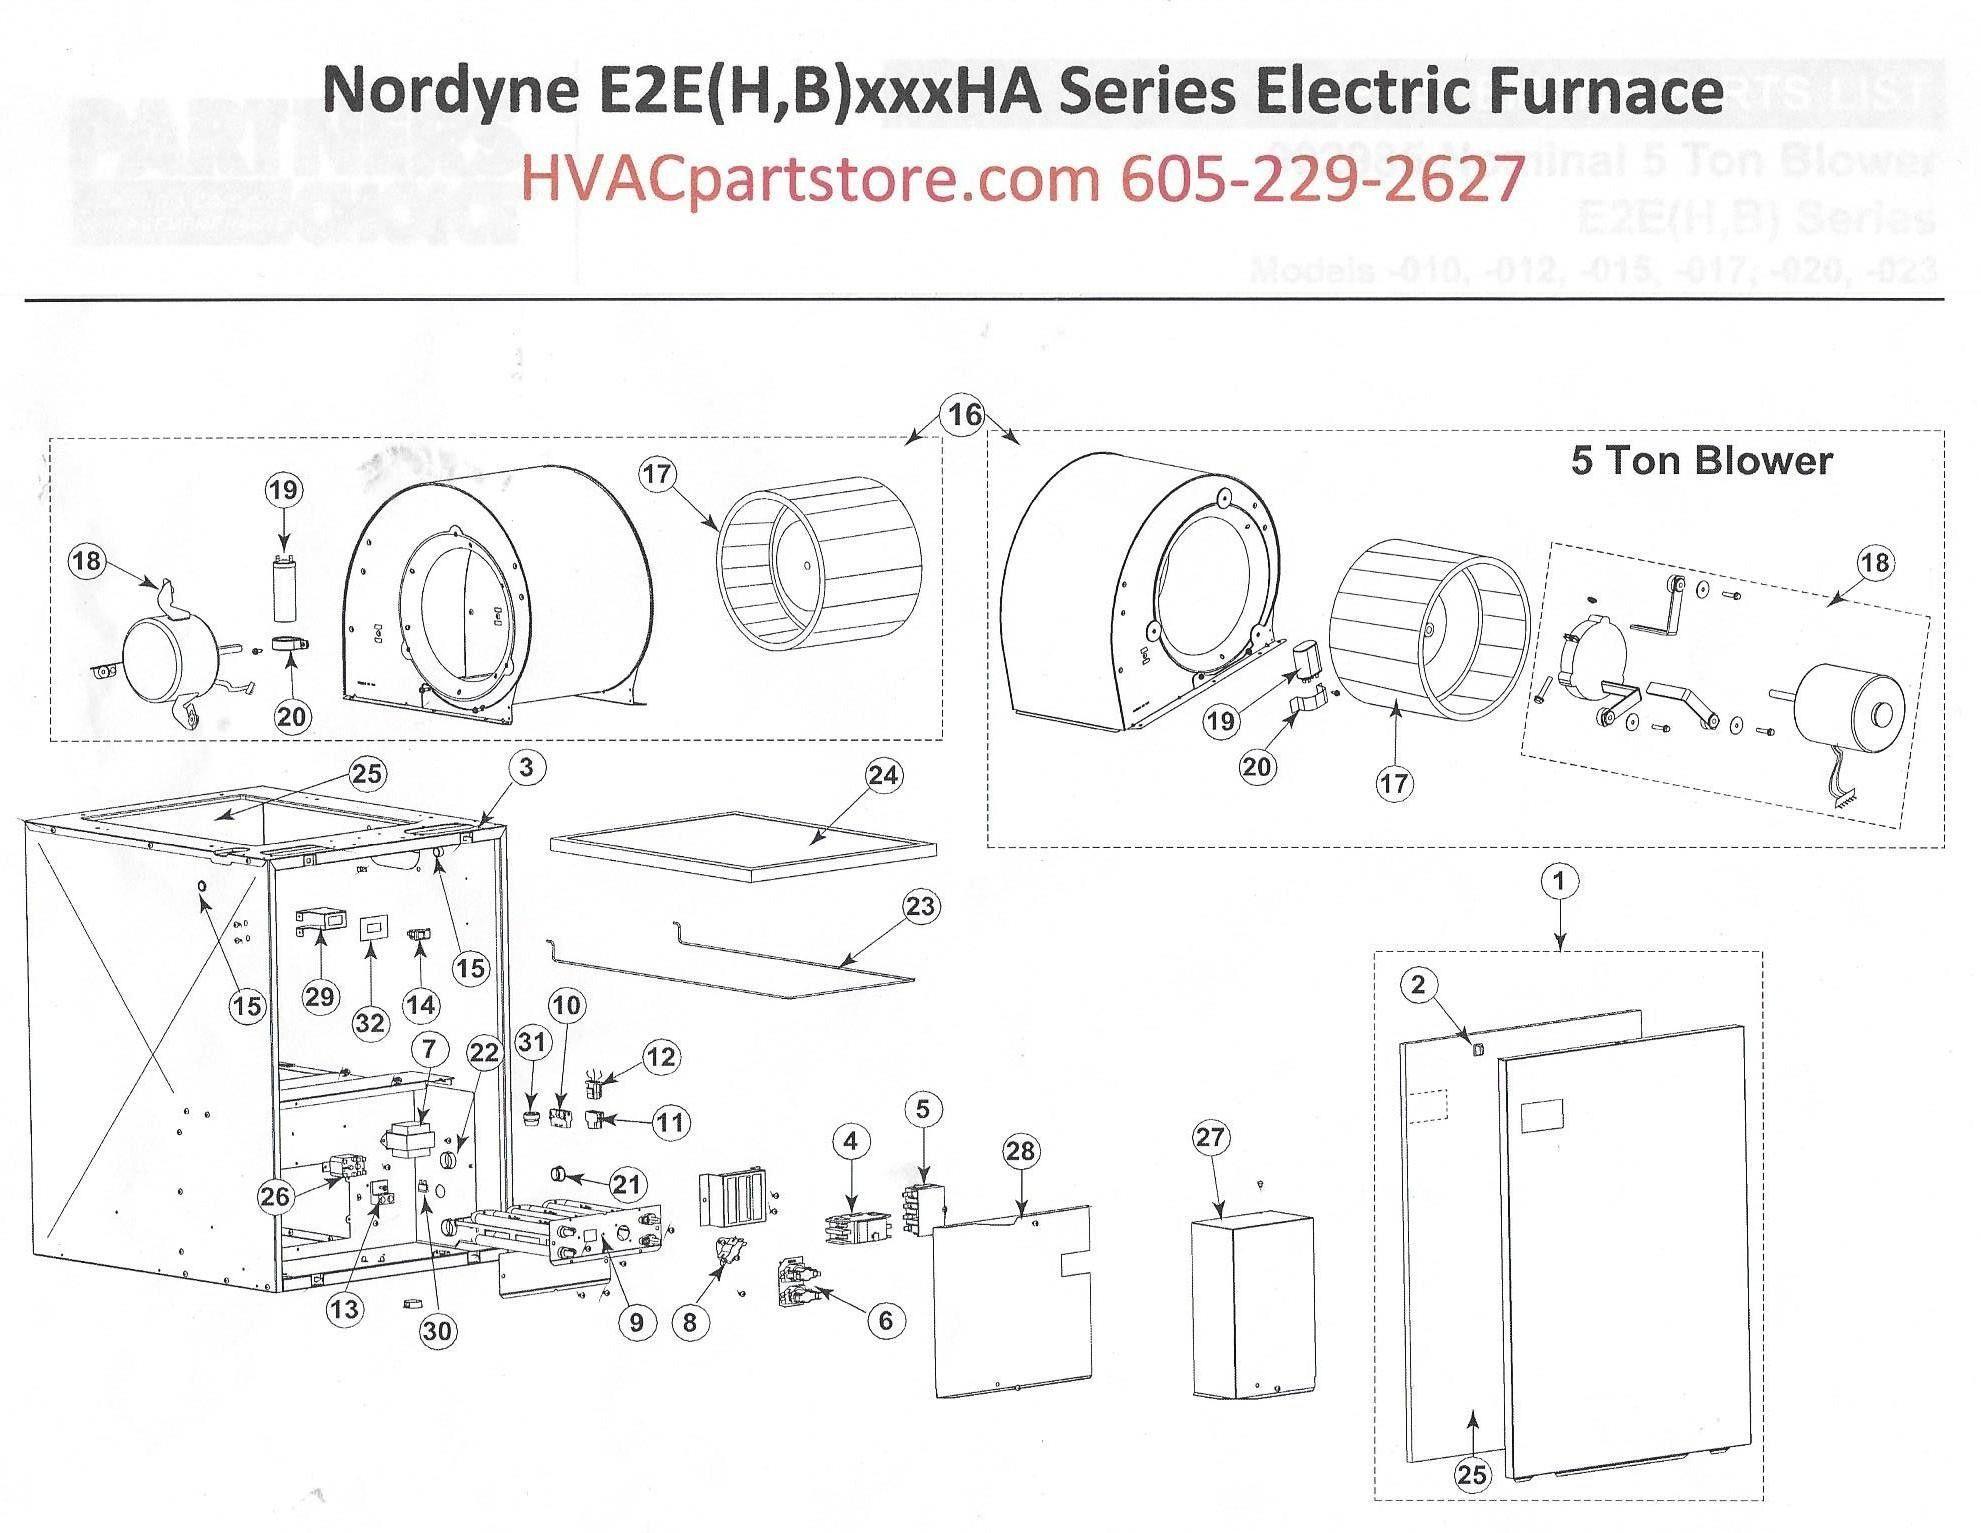 New Wiring Diagram For Nordyne Gas Furnace Diagram